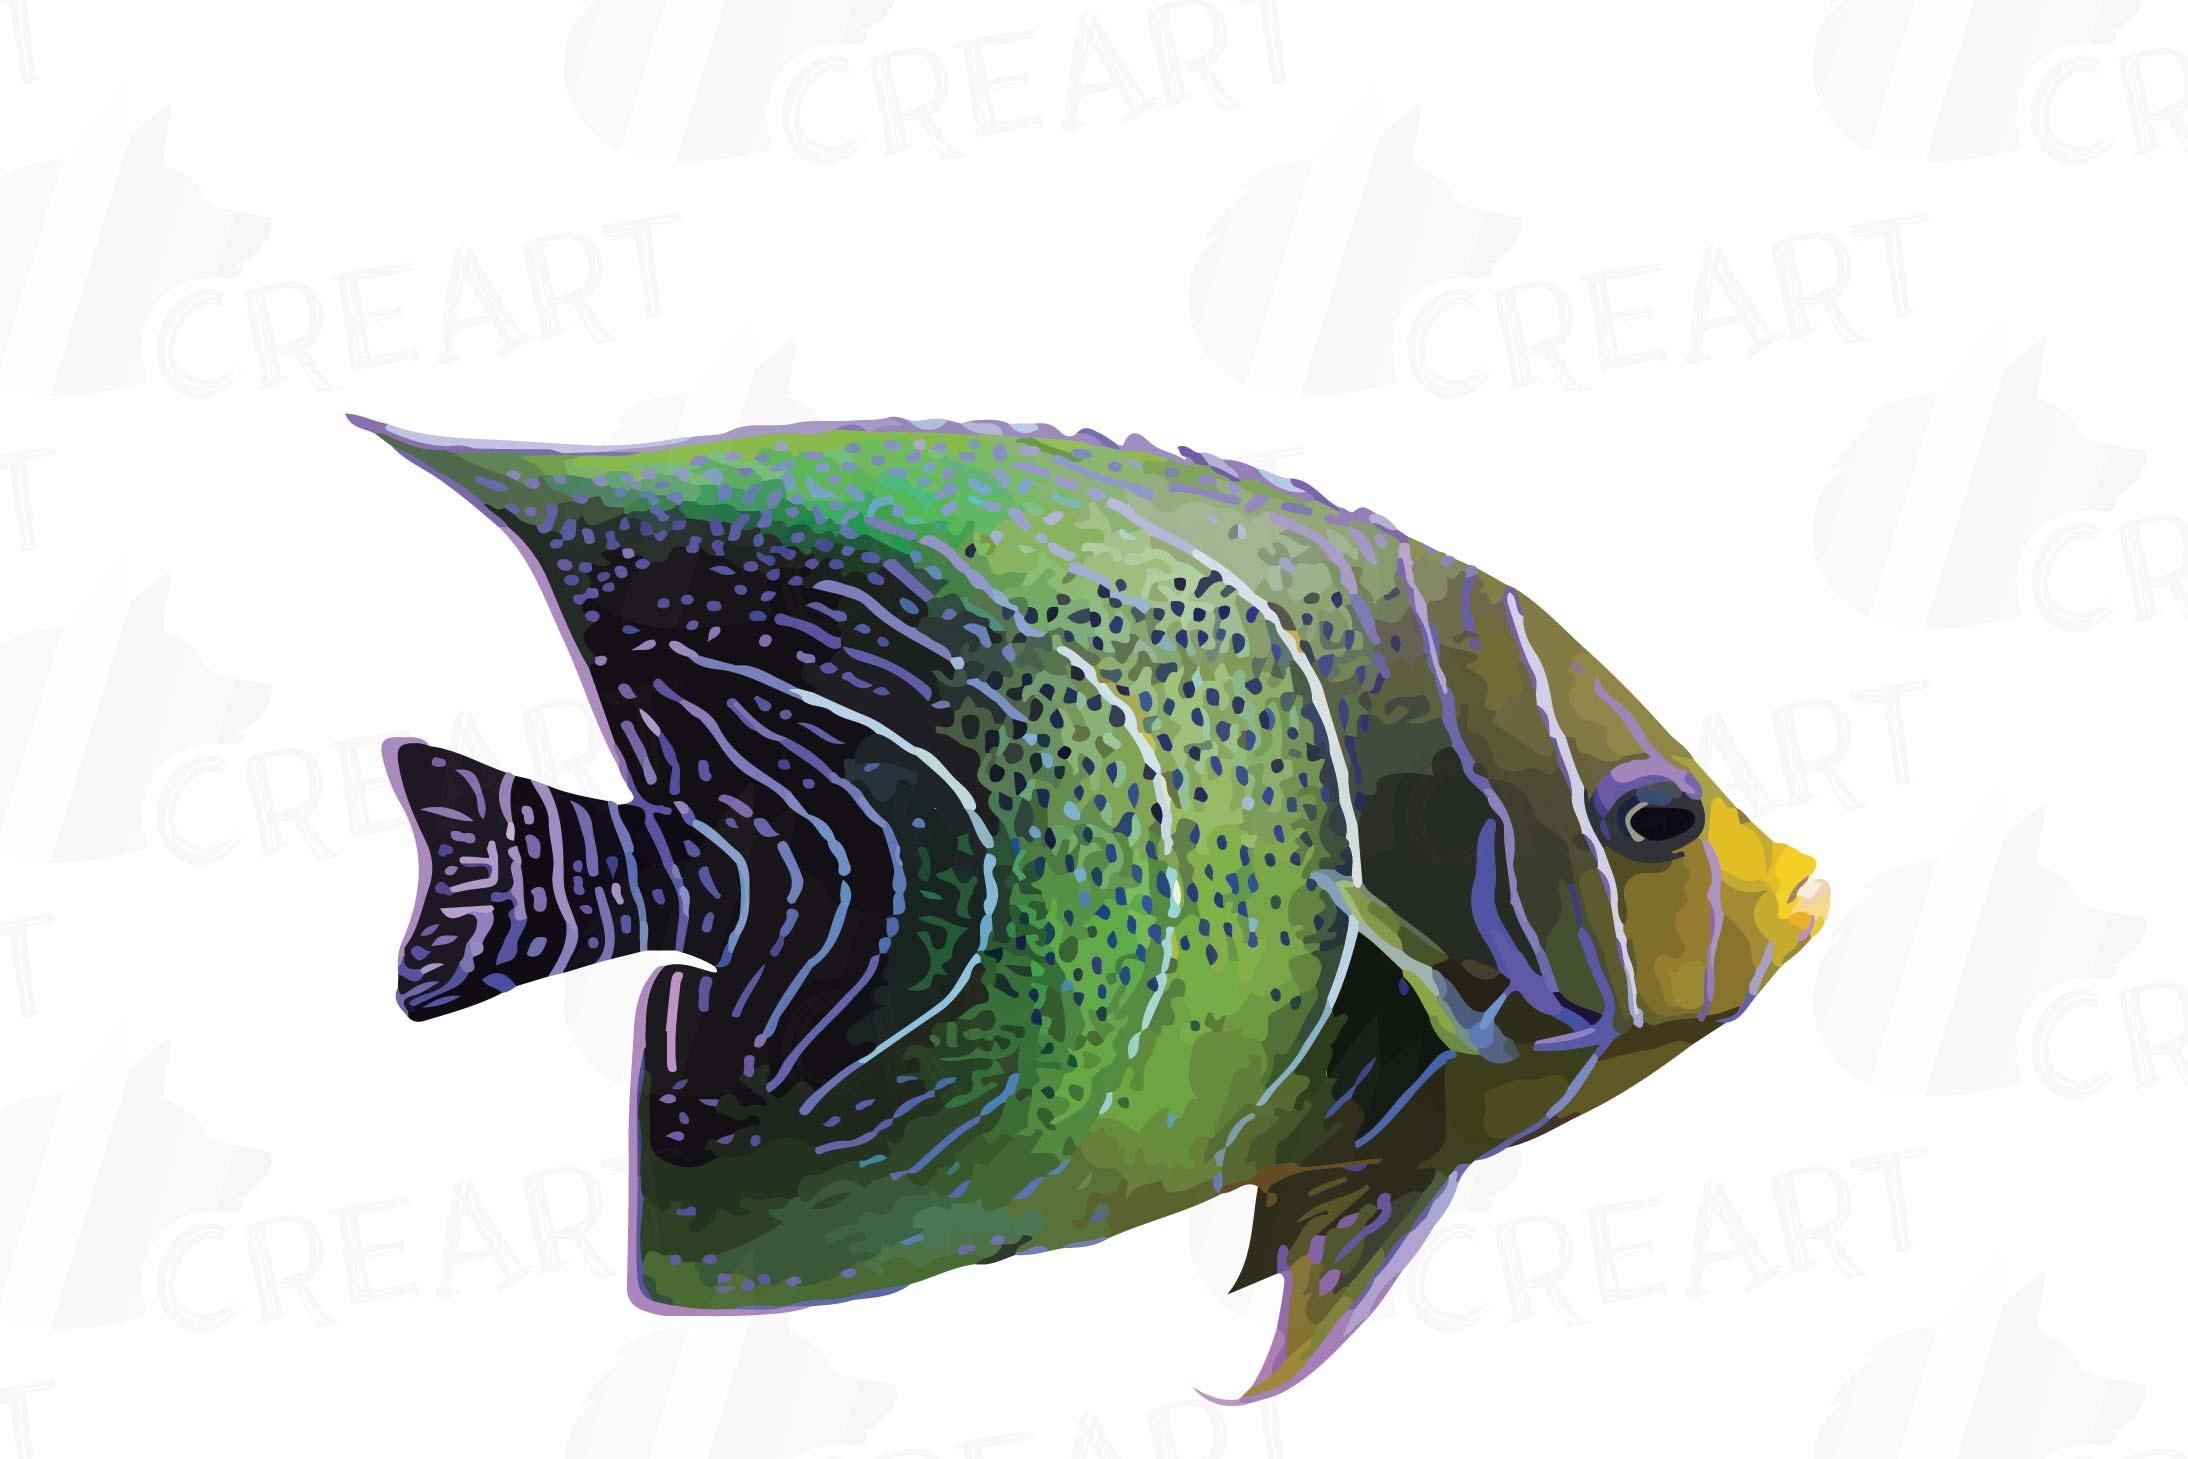 Watecolor Tropical Fish Clip Art 12 Vectors Example Image 3